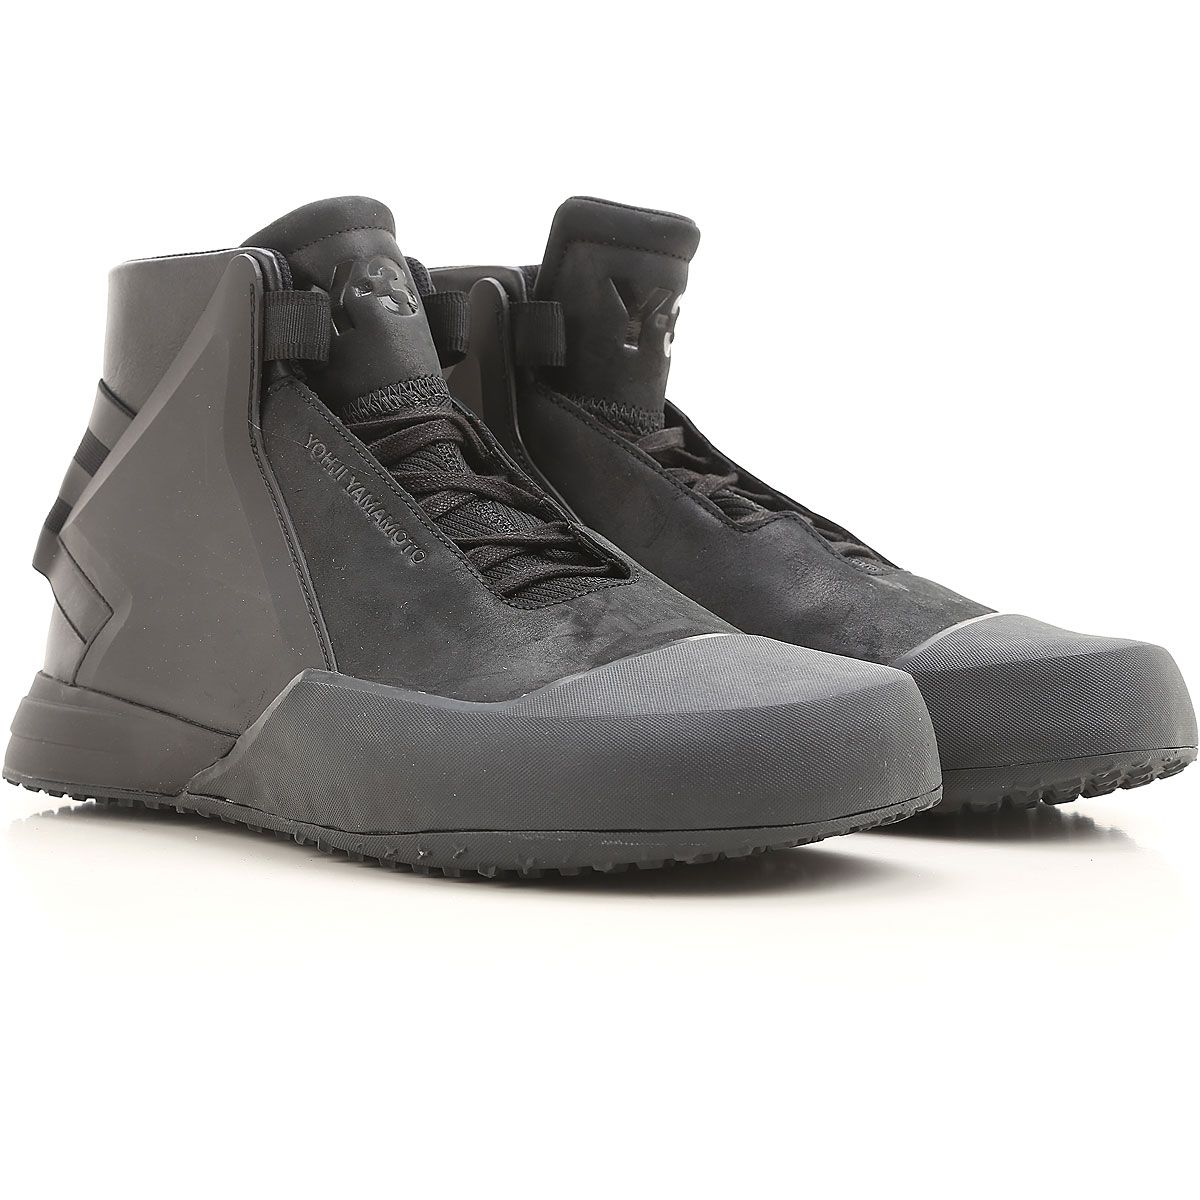 f10c67183a629 Mens Shoes Y3 by Yohji Yamamoto